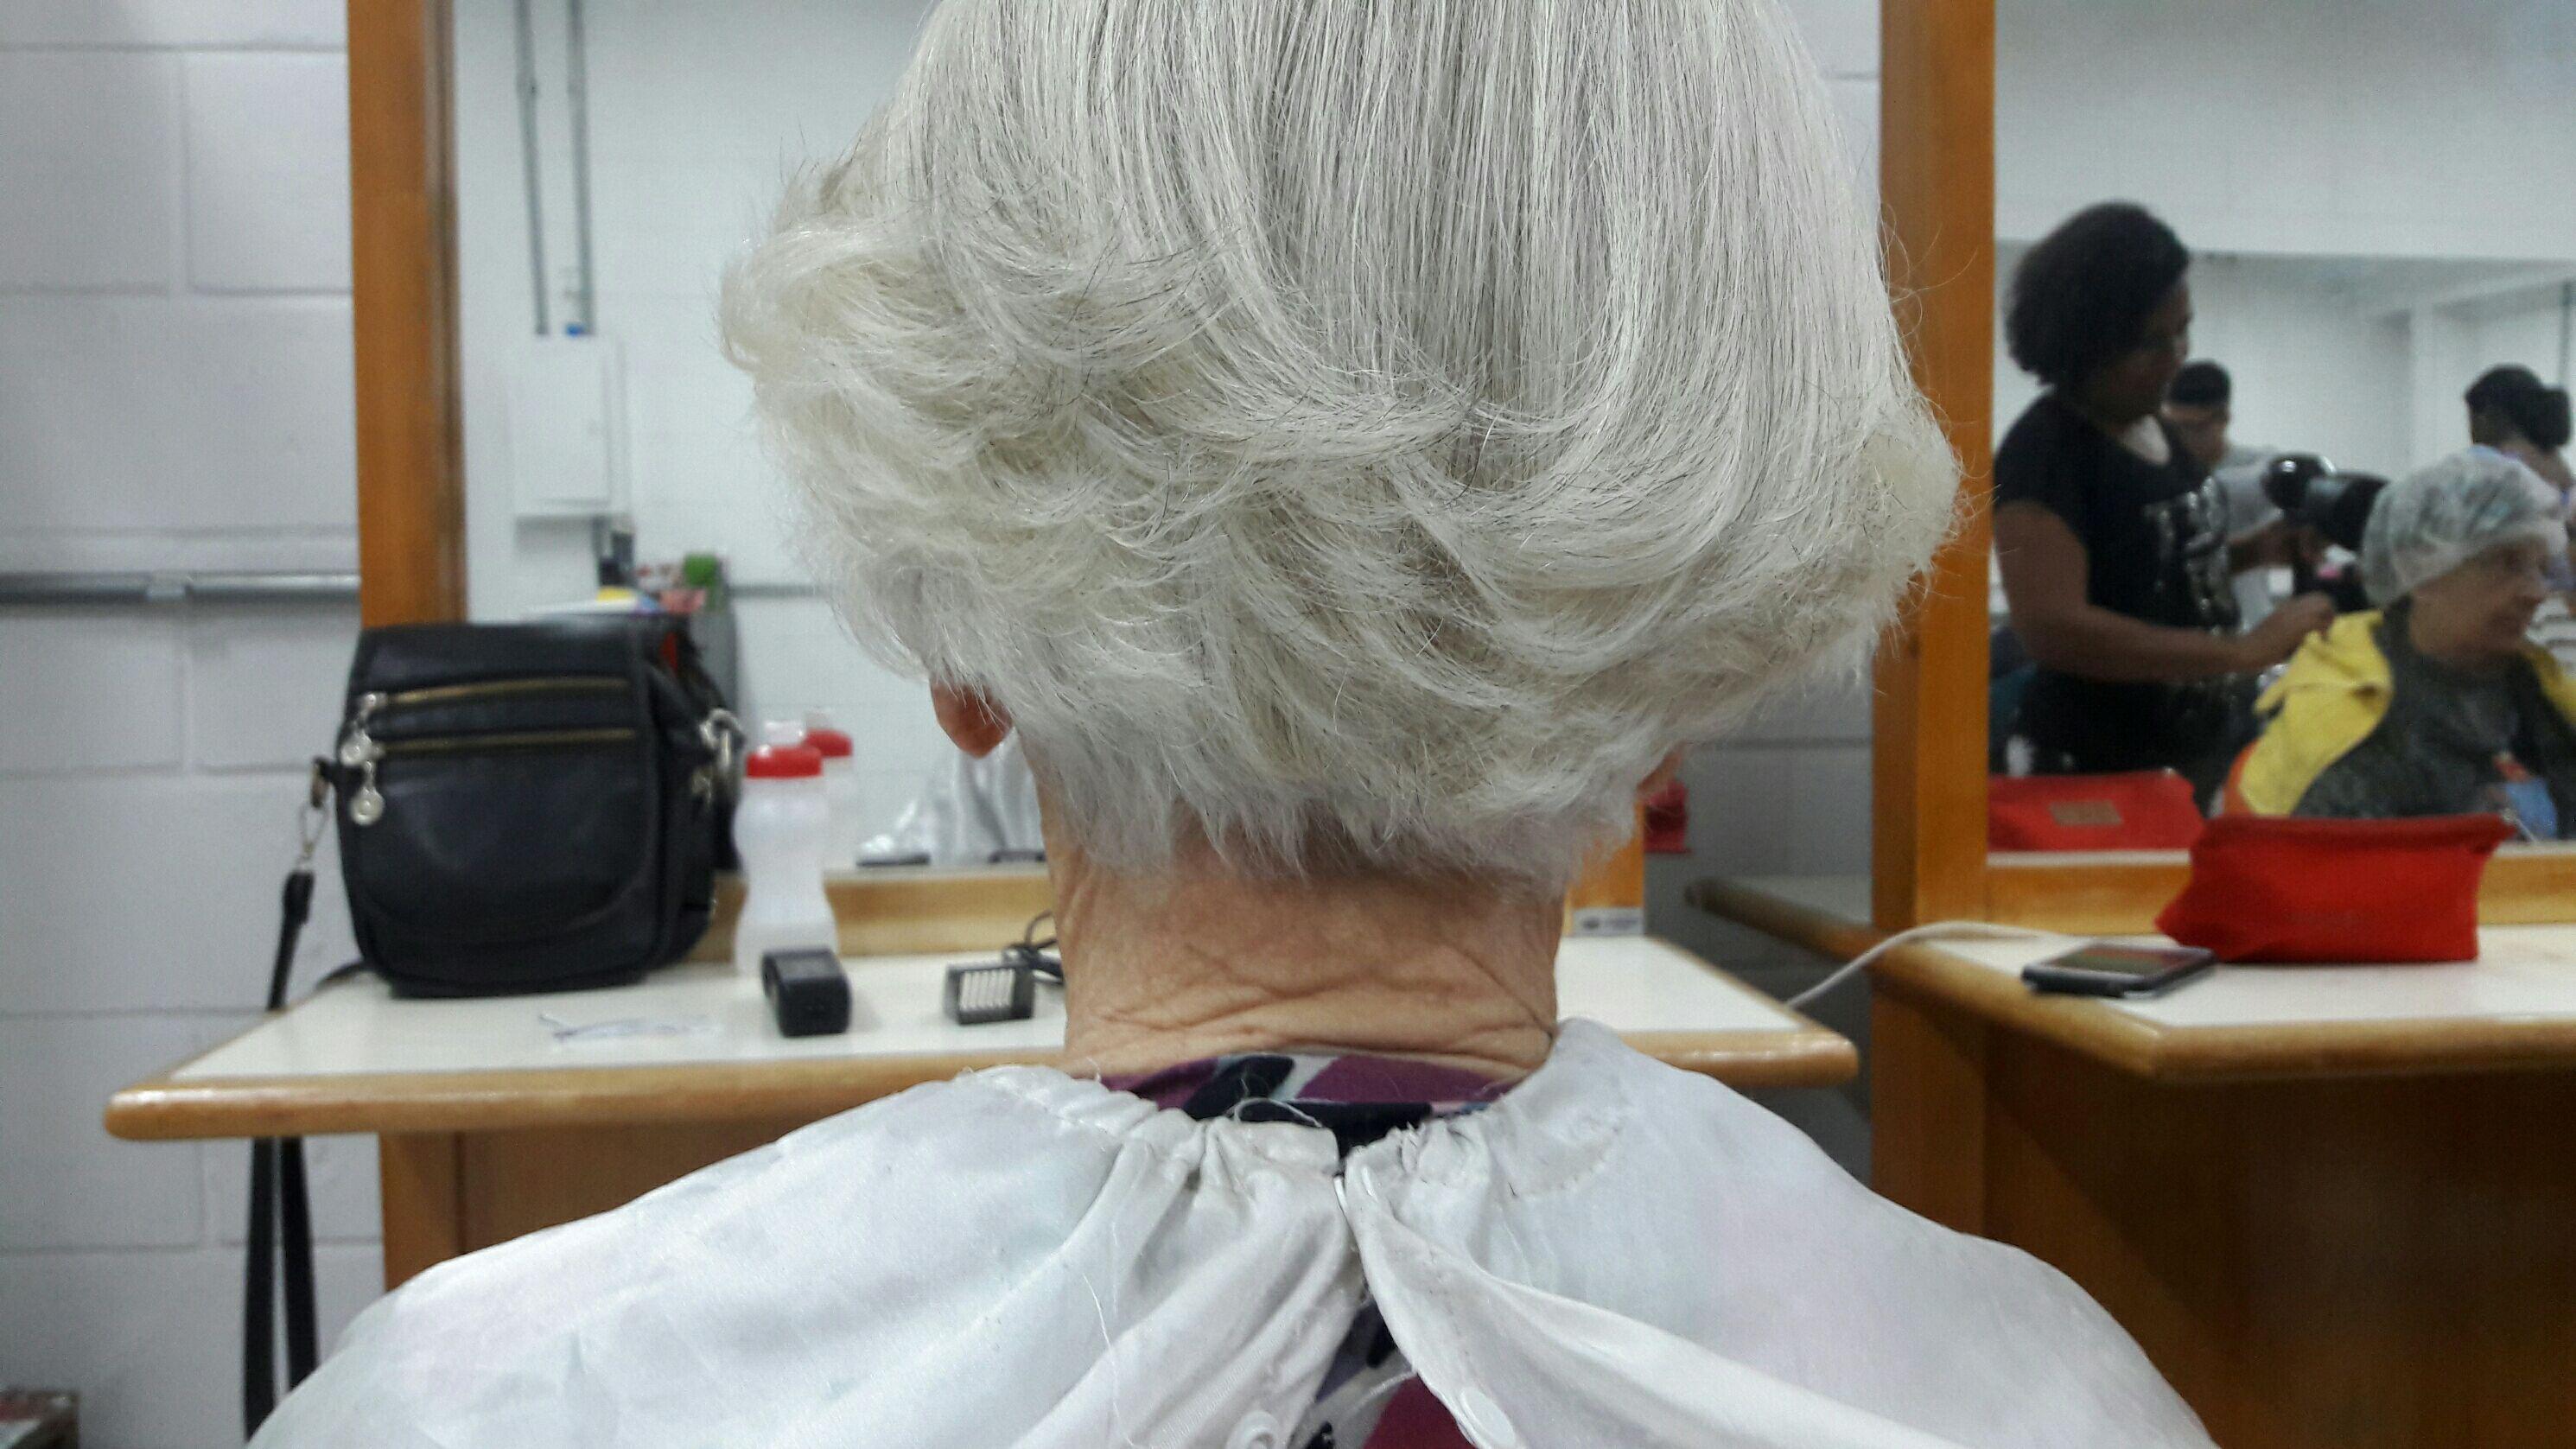 cabeleireiro(a) auxiliar cabeleireiro(a) manicure e pedicure